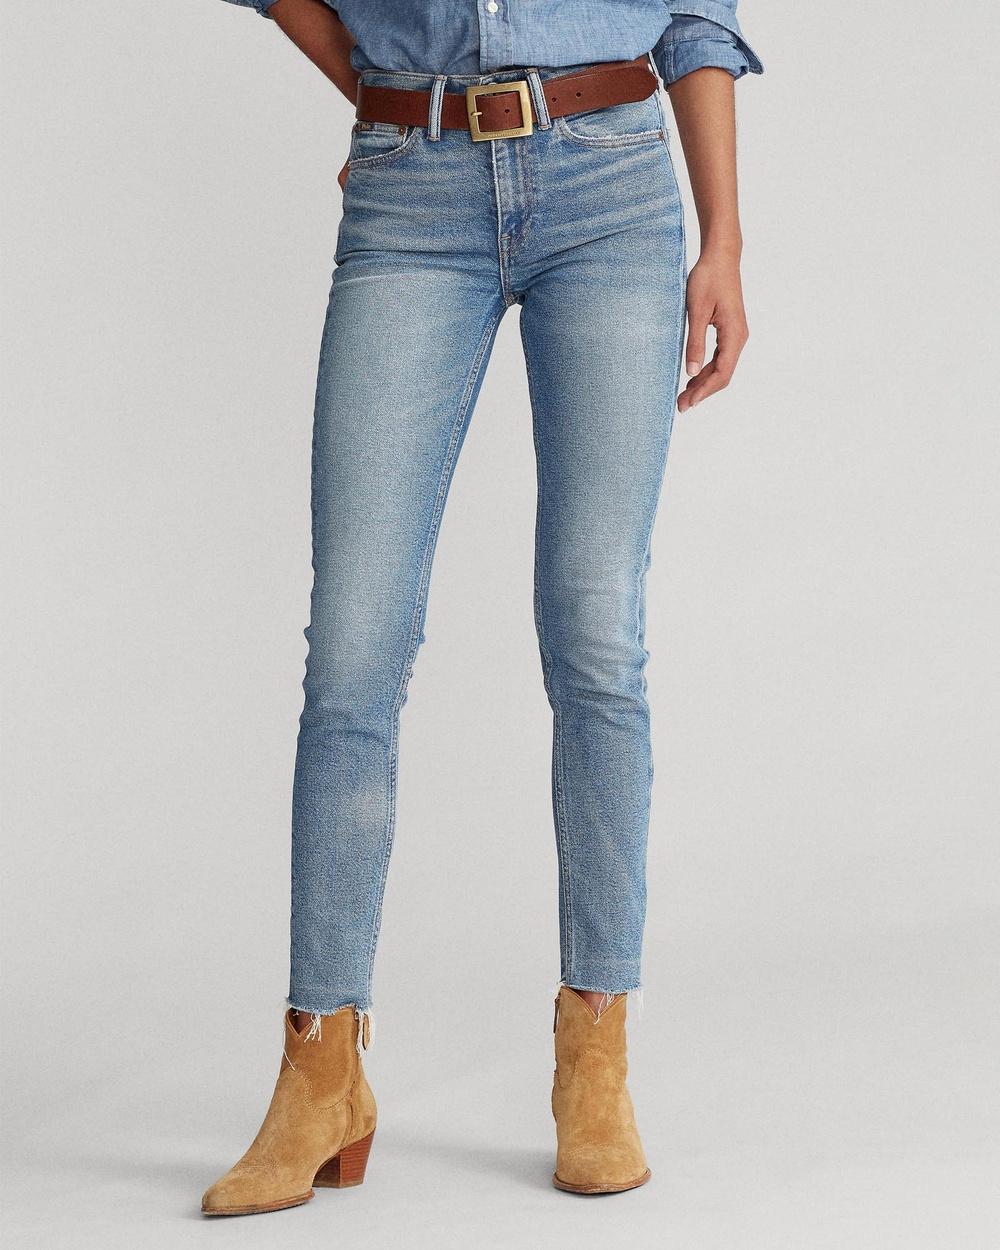 Polo Ralph Lauren Tompkins High Rise Skinny Jeans High-Waisted Light Indigo High-Rise Australia